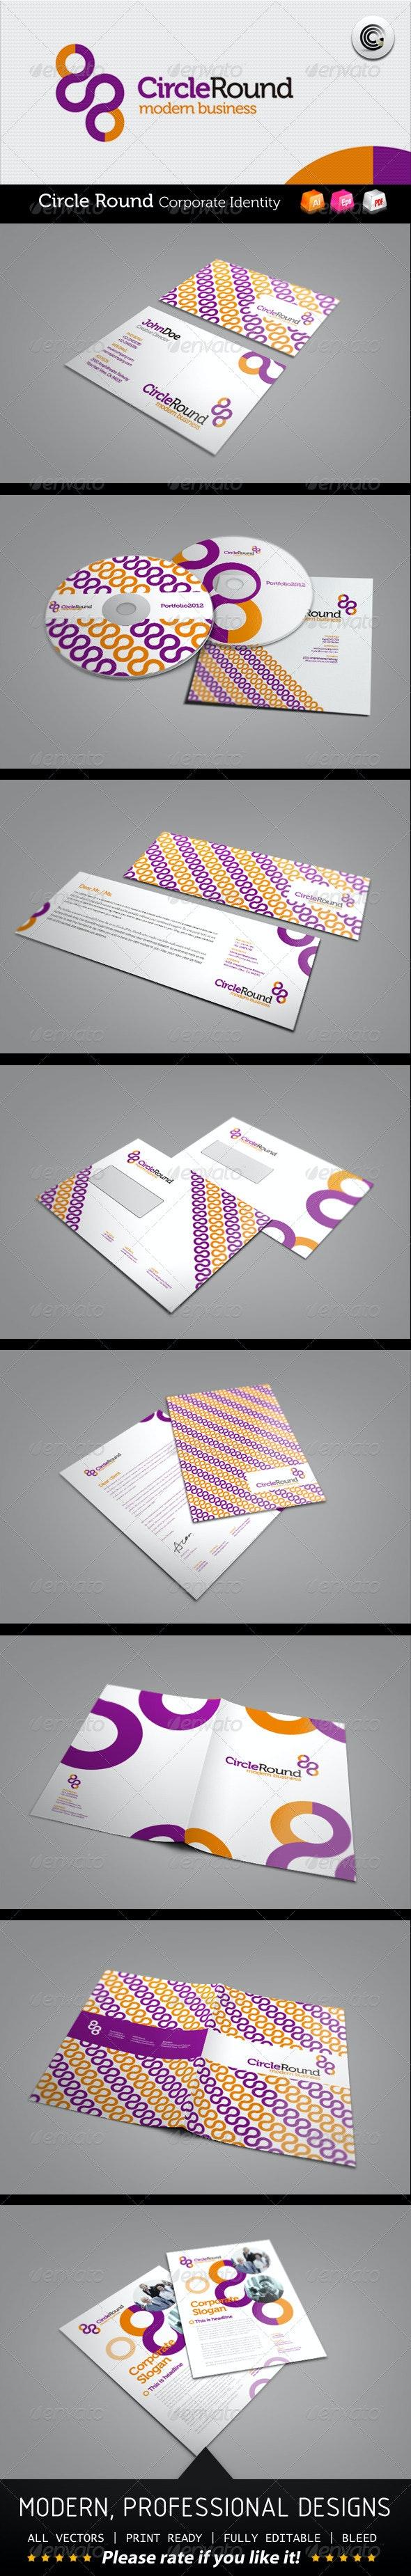 Circle Round Modern Business Corporate Identity - Stationery Print Templates